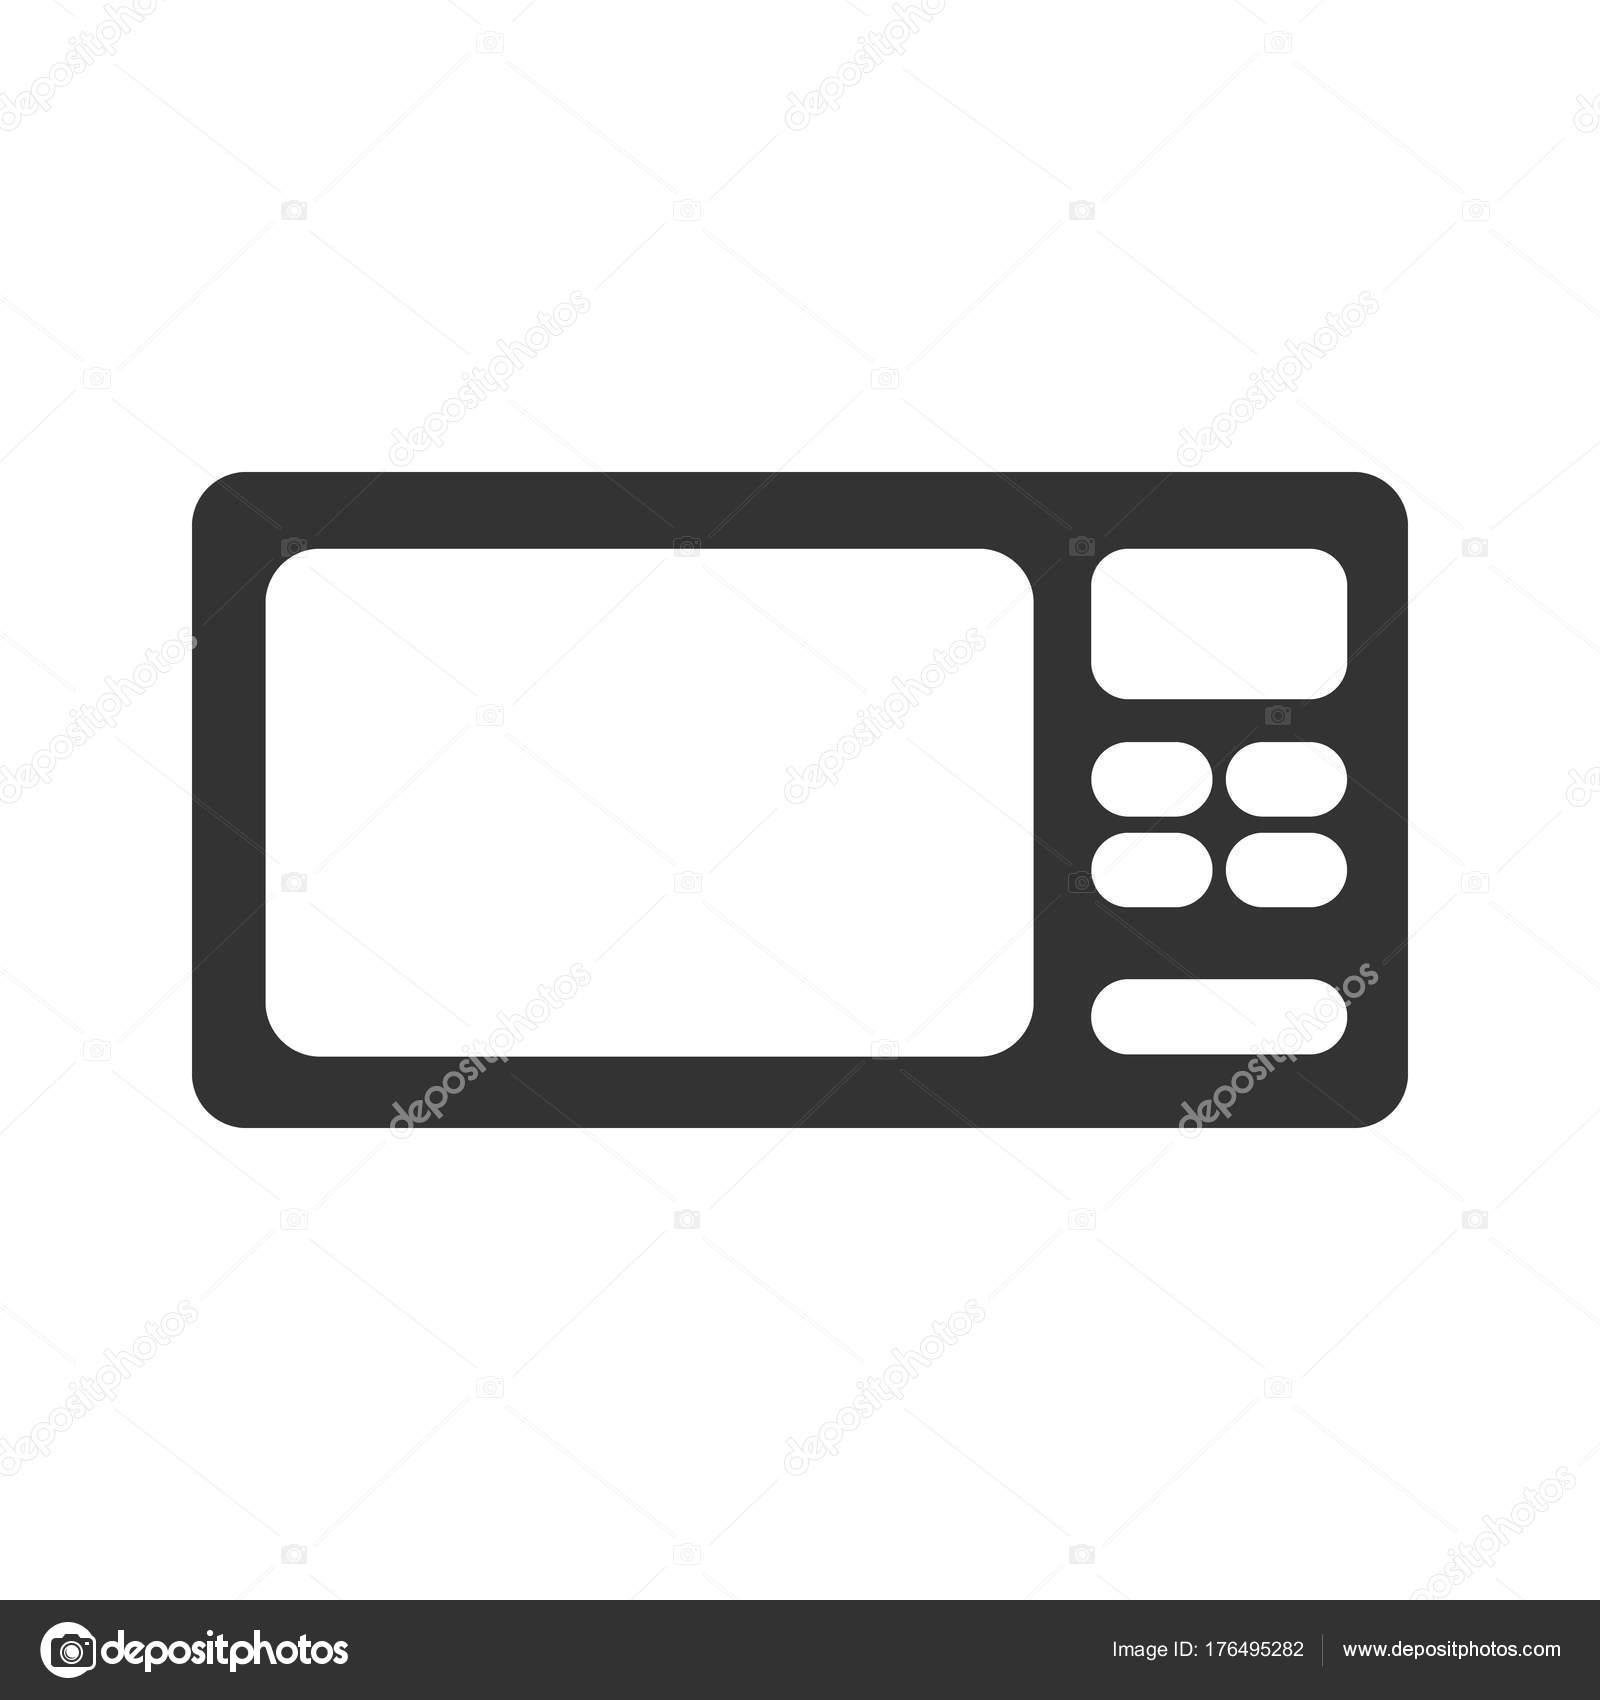 Mikrowelle-Symbol. Vereinfachte Mikrowelle Symbol Vektor. Küche ...